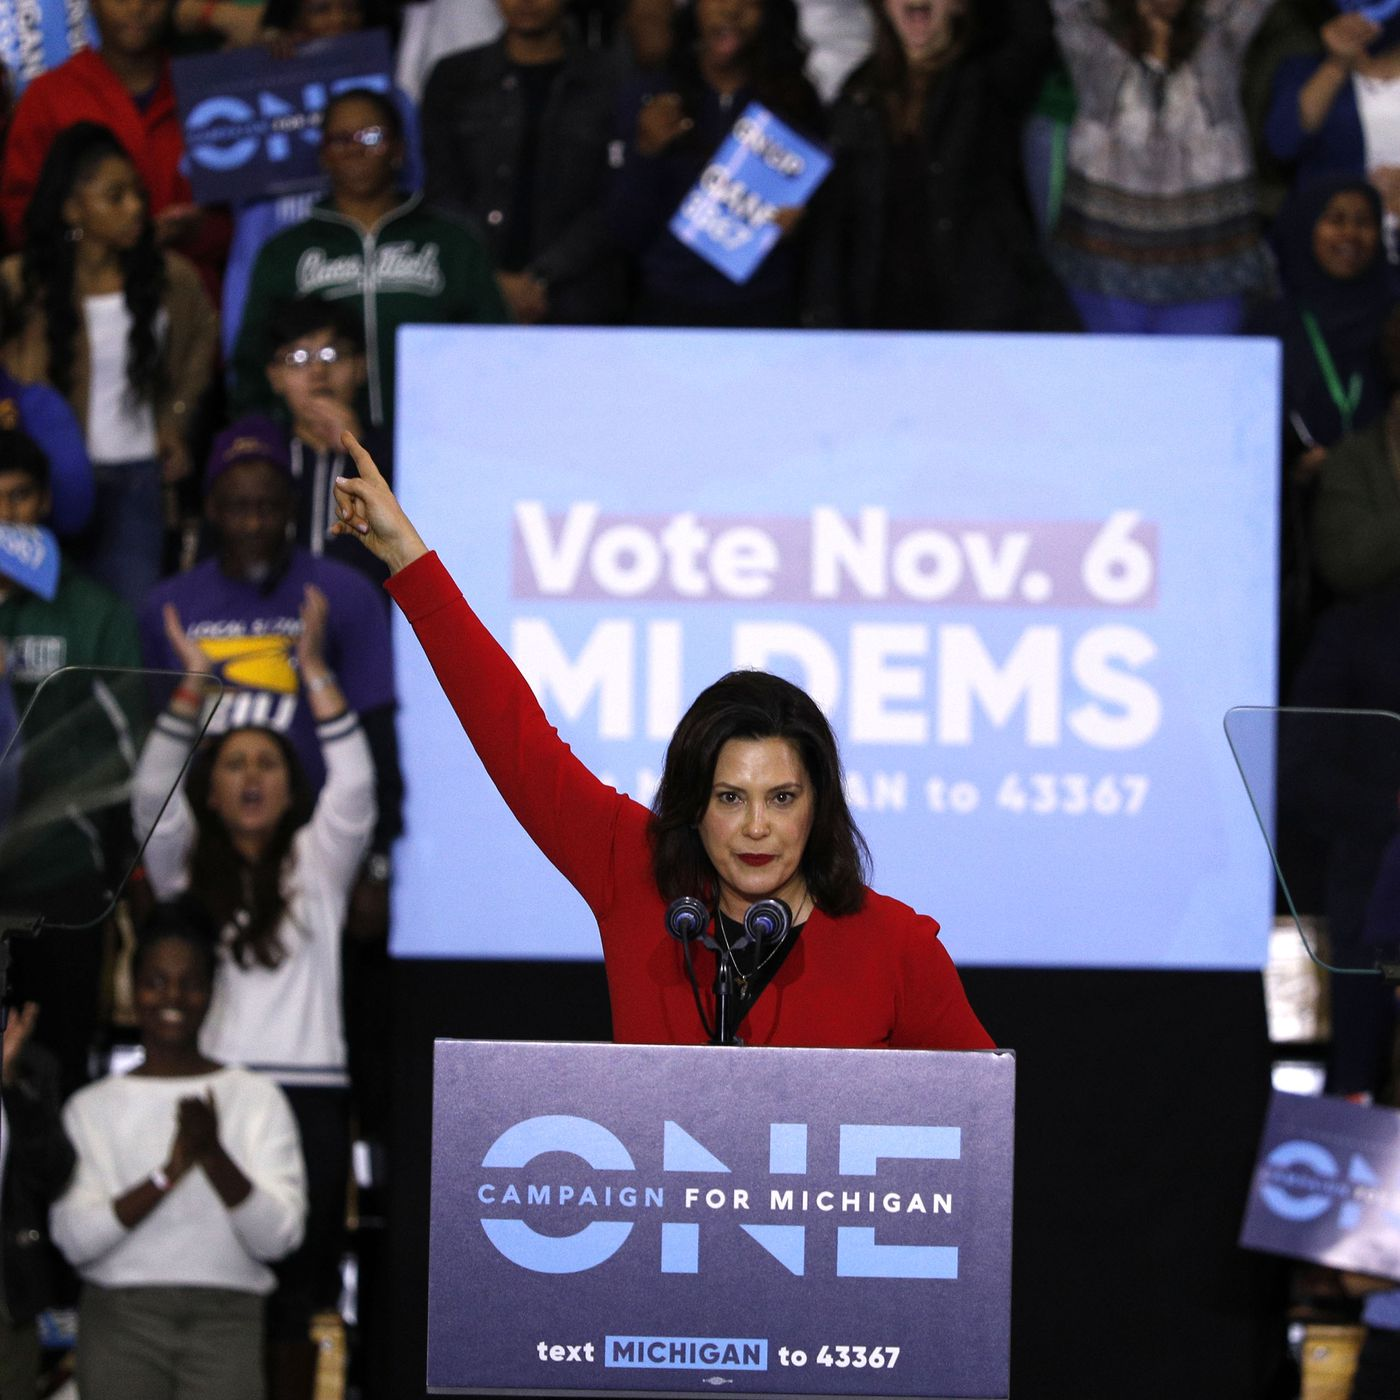 Democrat Gretchen Whitmer Wins Michigan Governor Race Beating Bill Schuette Vox